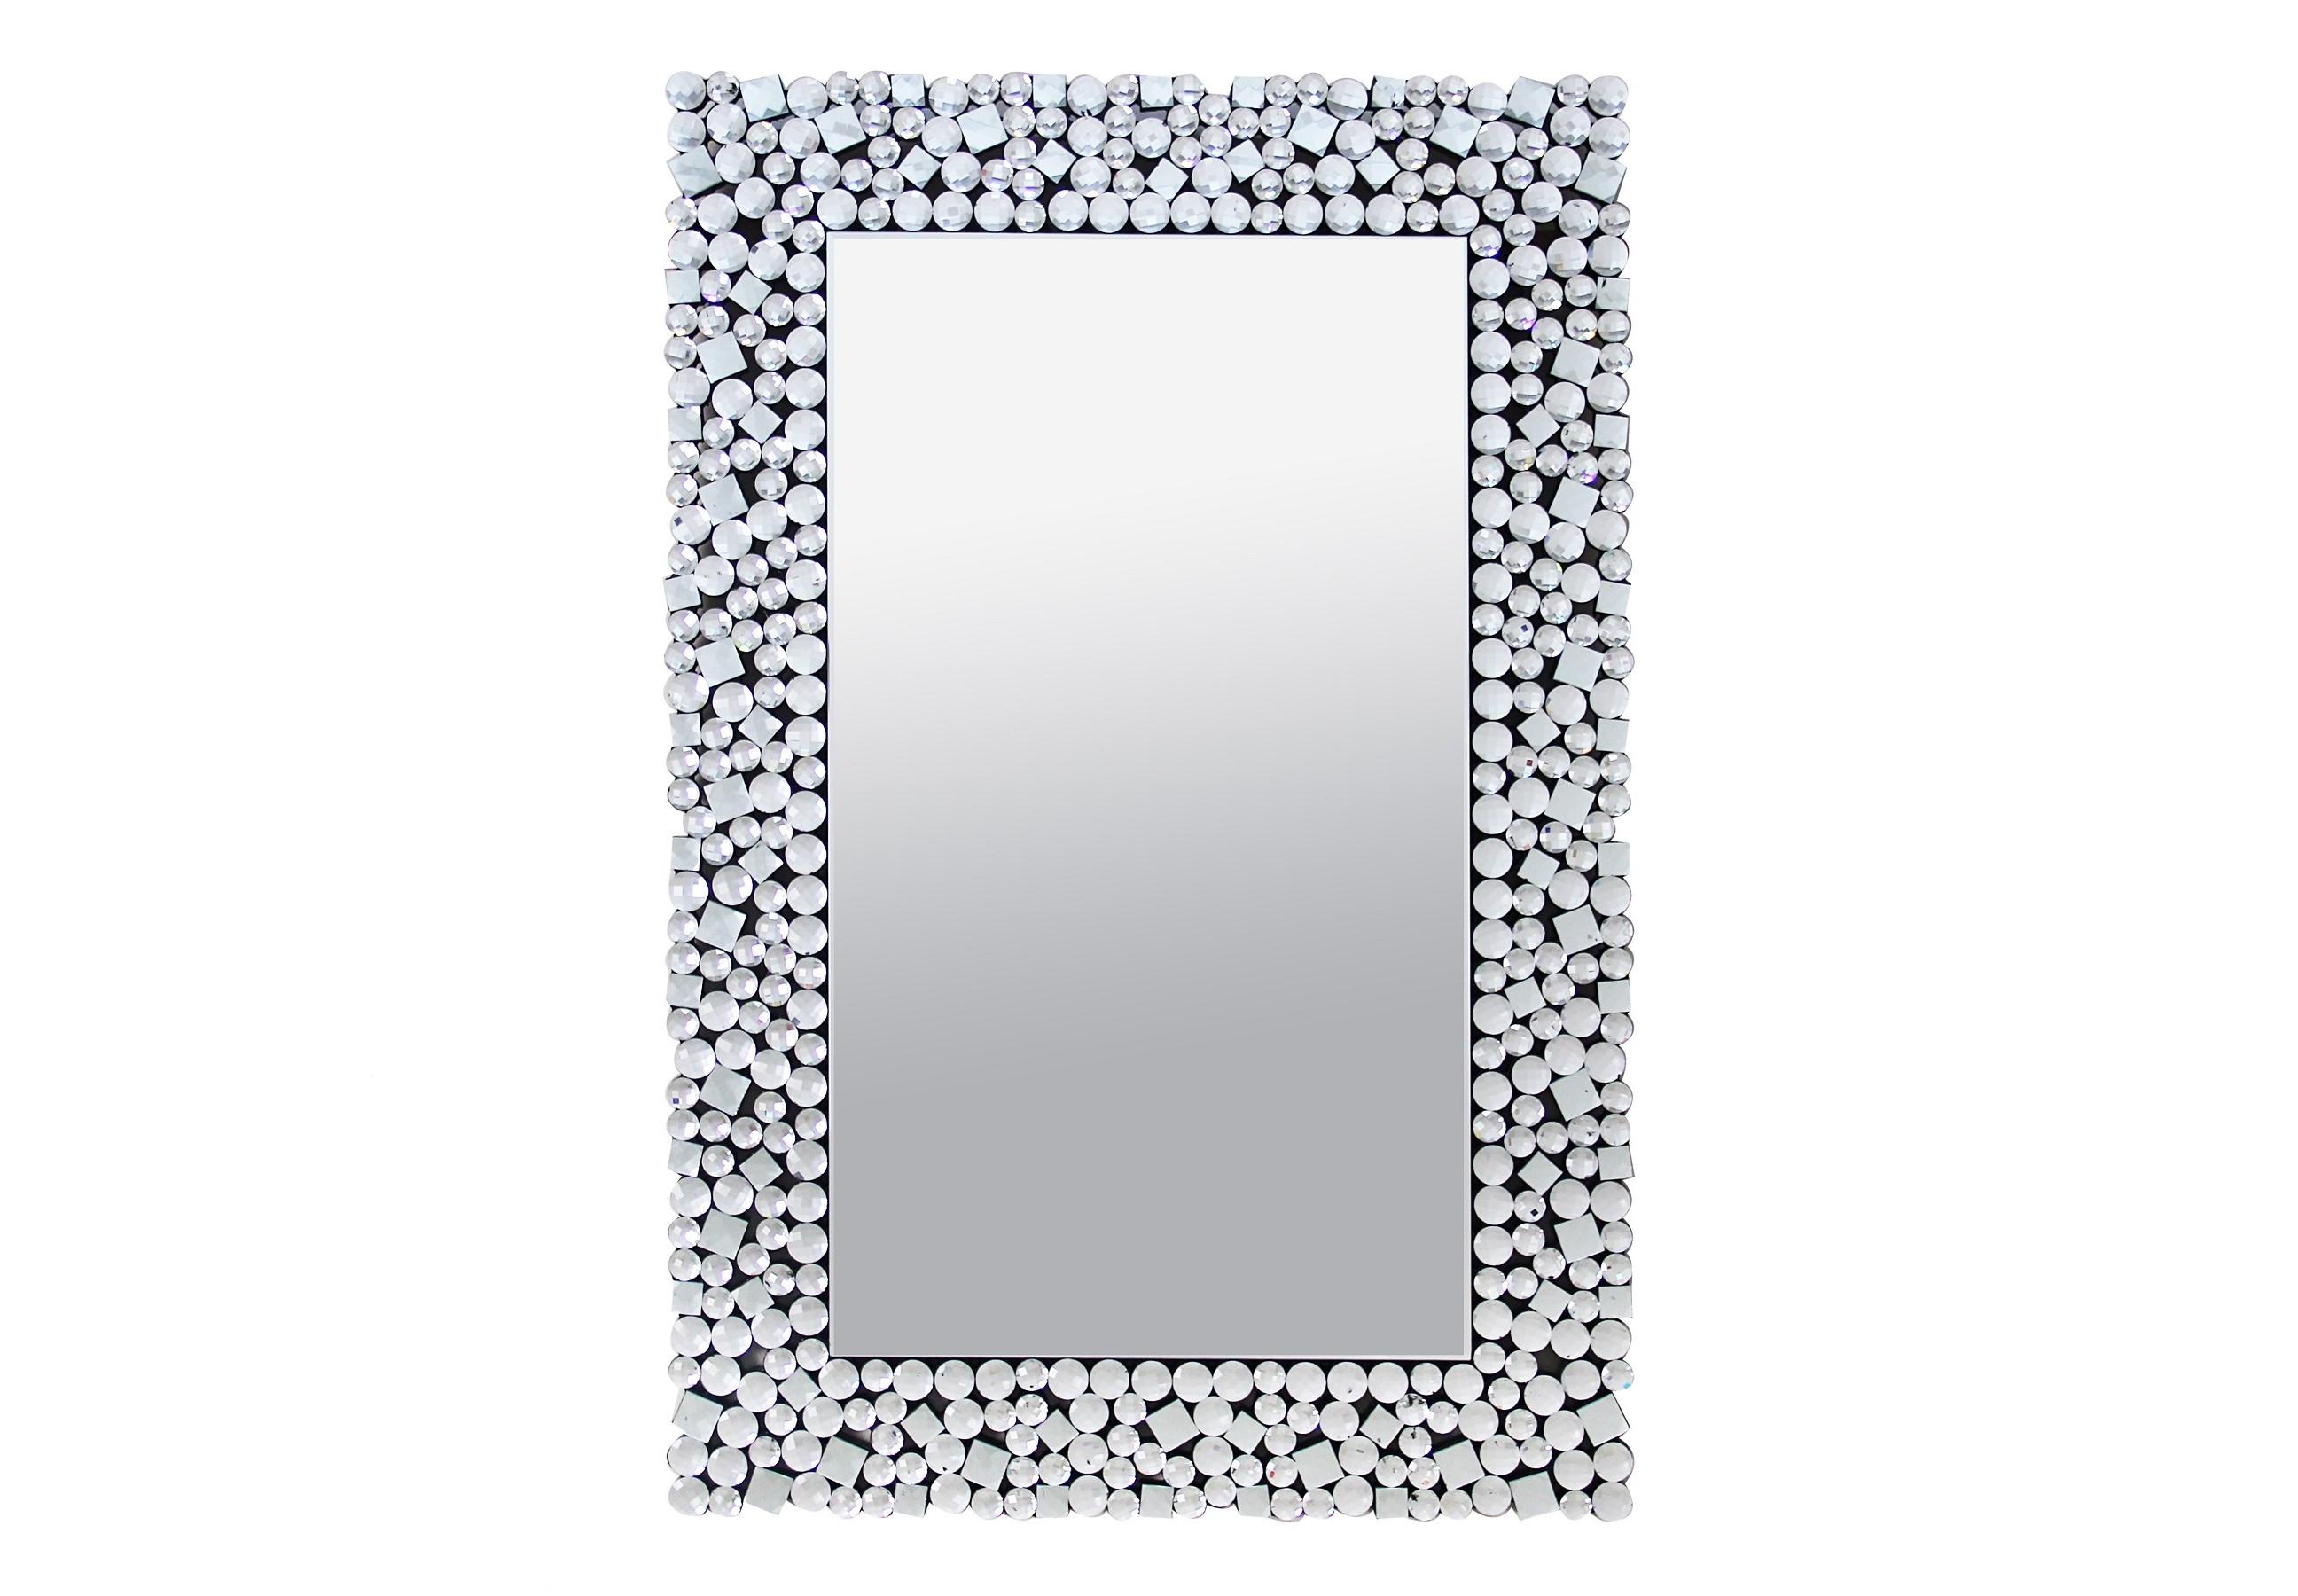 Зеркало BriciolaНастенные зеркала<br><br><br>Material: МДФ<br>Length см: None<br>Width см: 60<br>Depth см: 1,9<br>Height см: 90